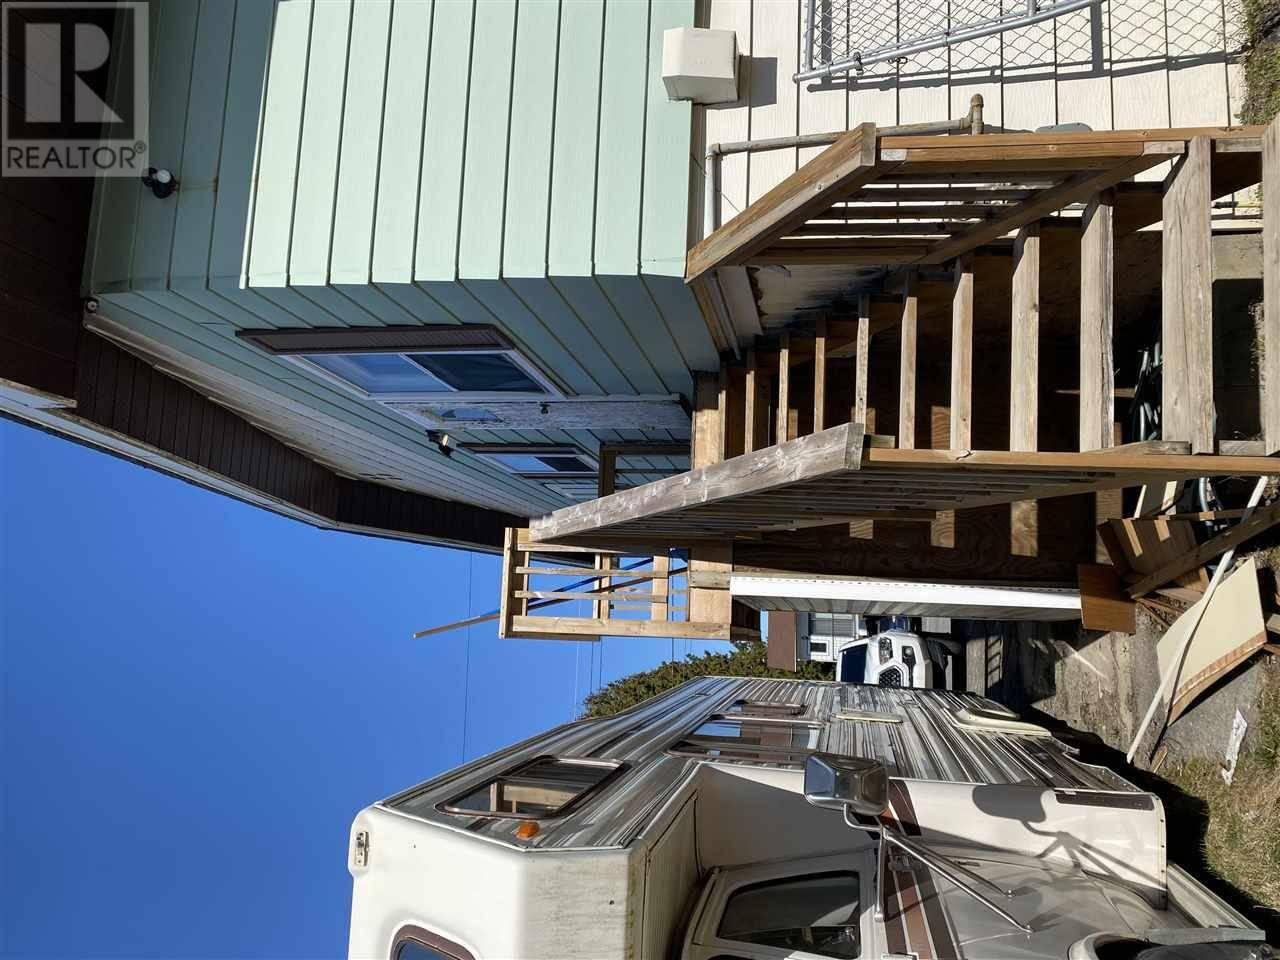 Townhouse for sale at 9 Widgeon St Kitimat British Columbia - MLS: R2450381